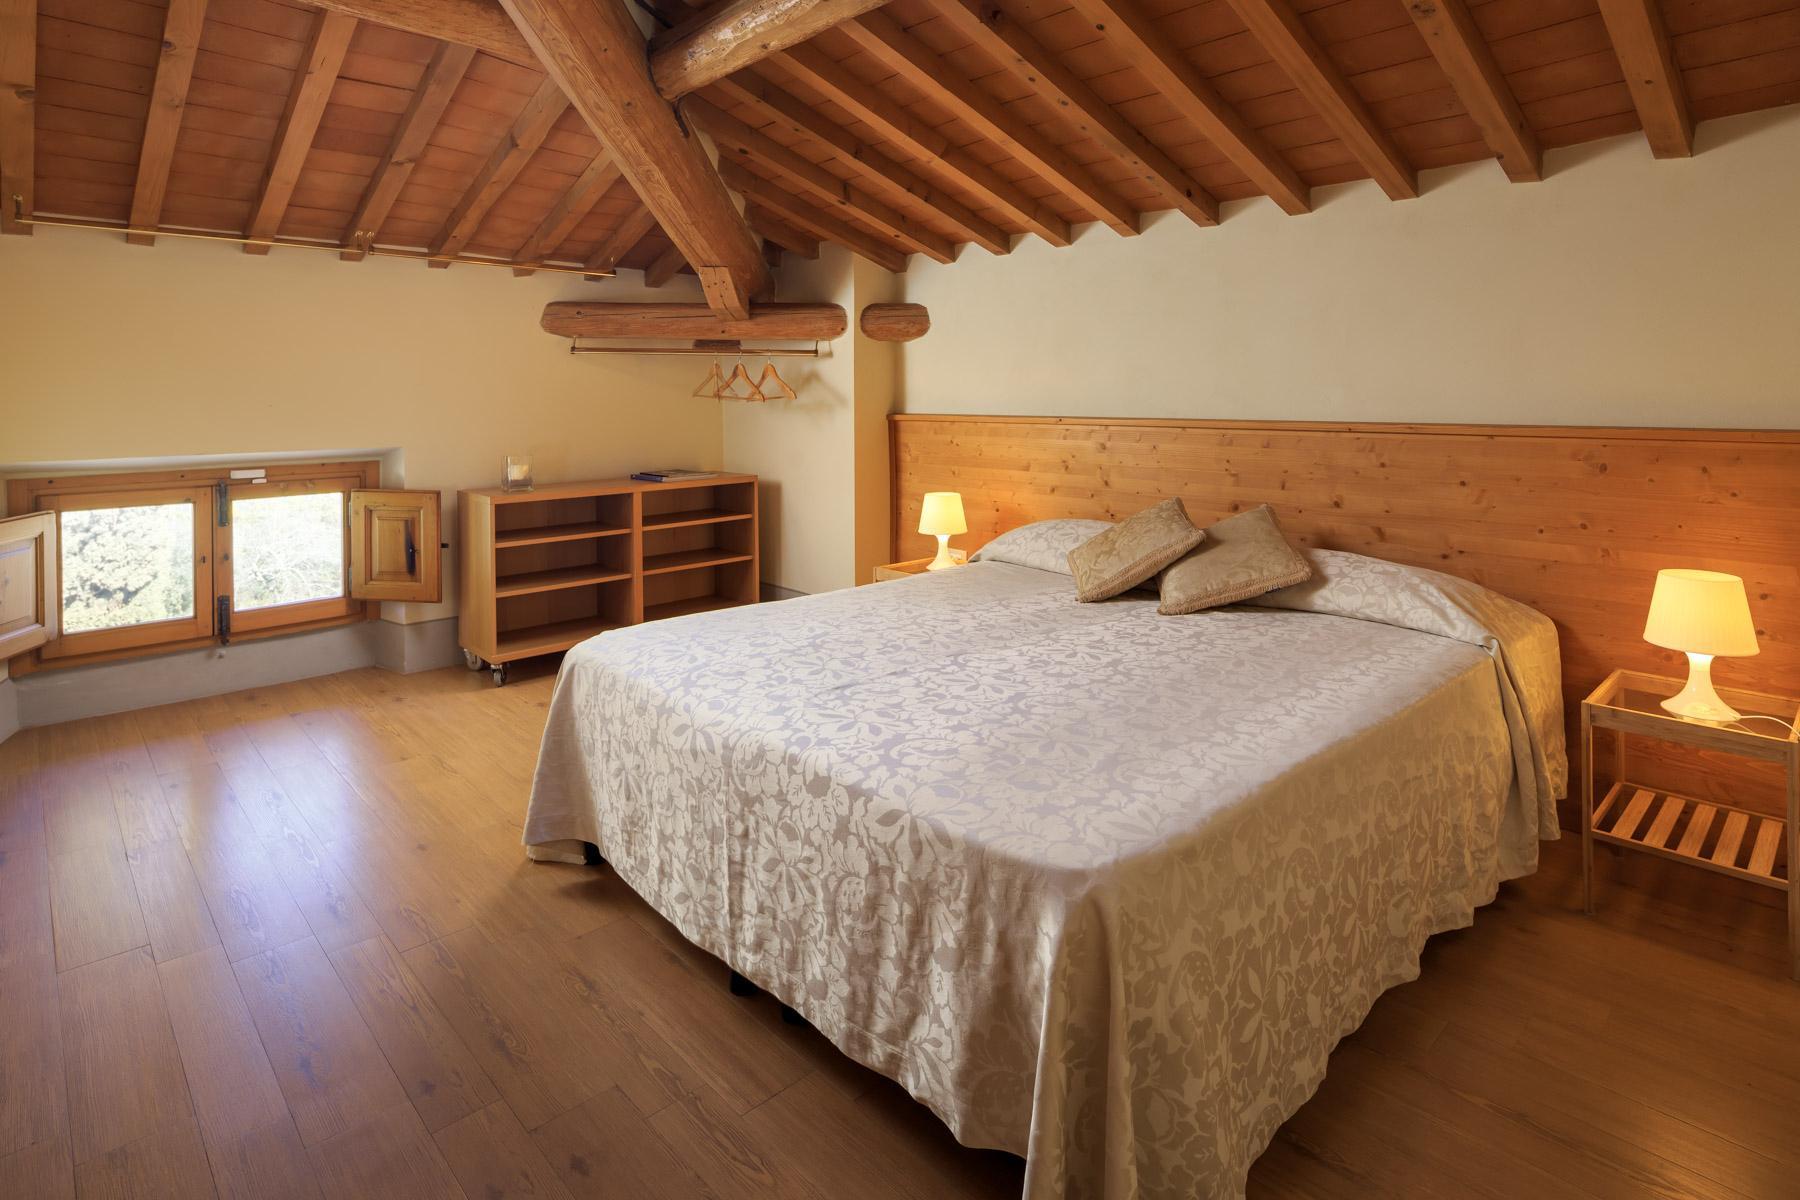 Montecatini Terme小镇优雅的新艺术风格的别墅 - 24